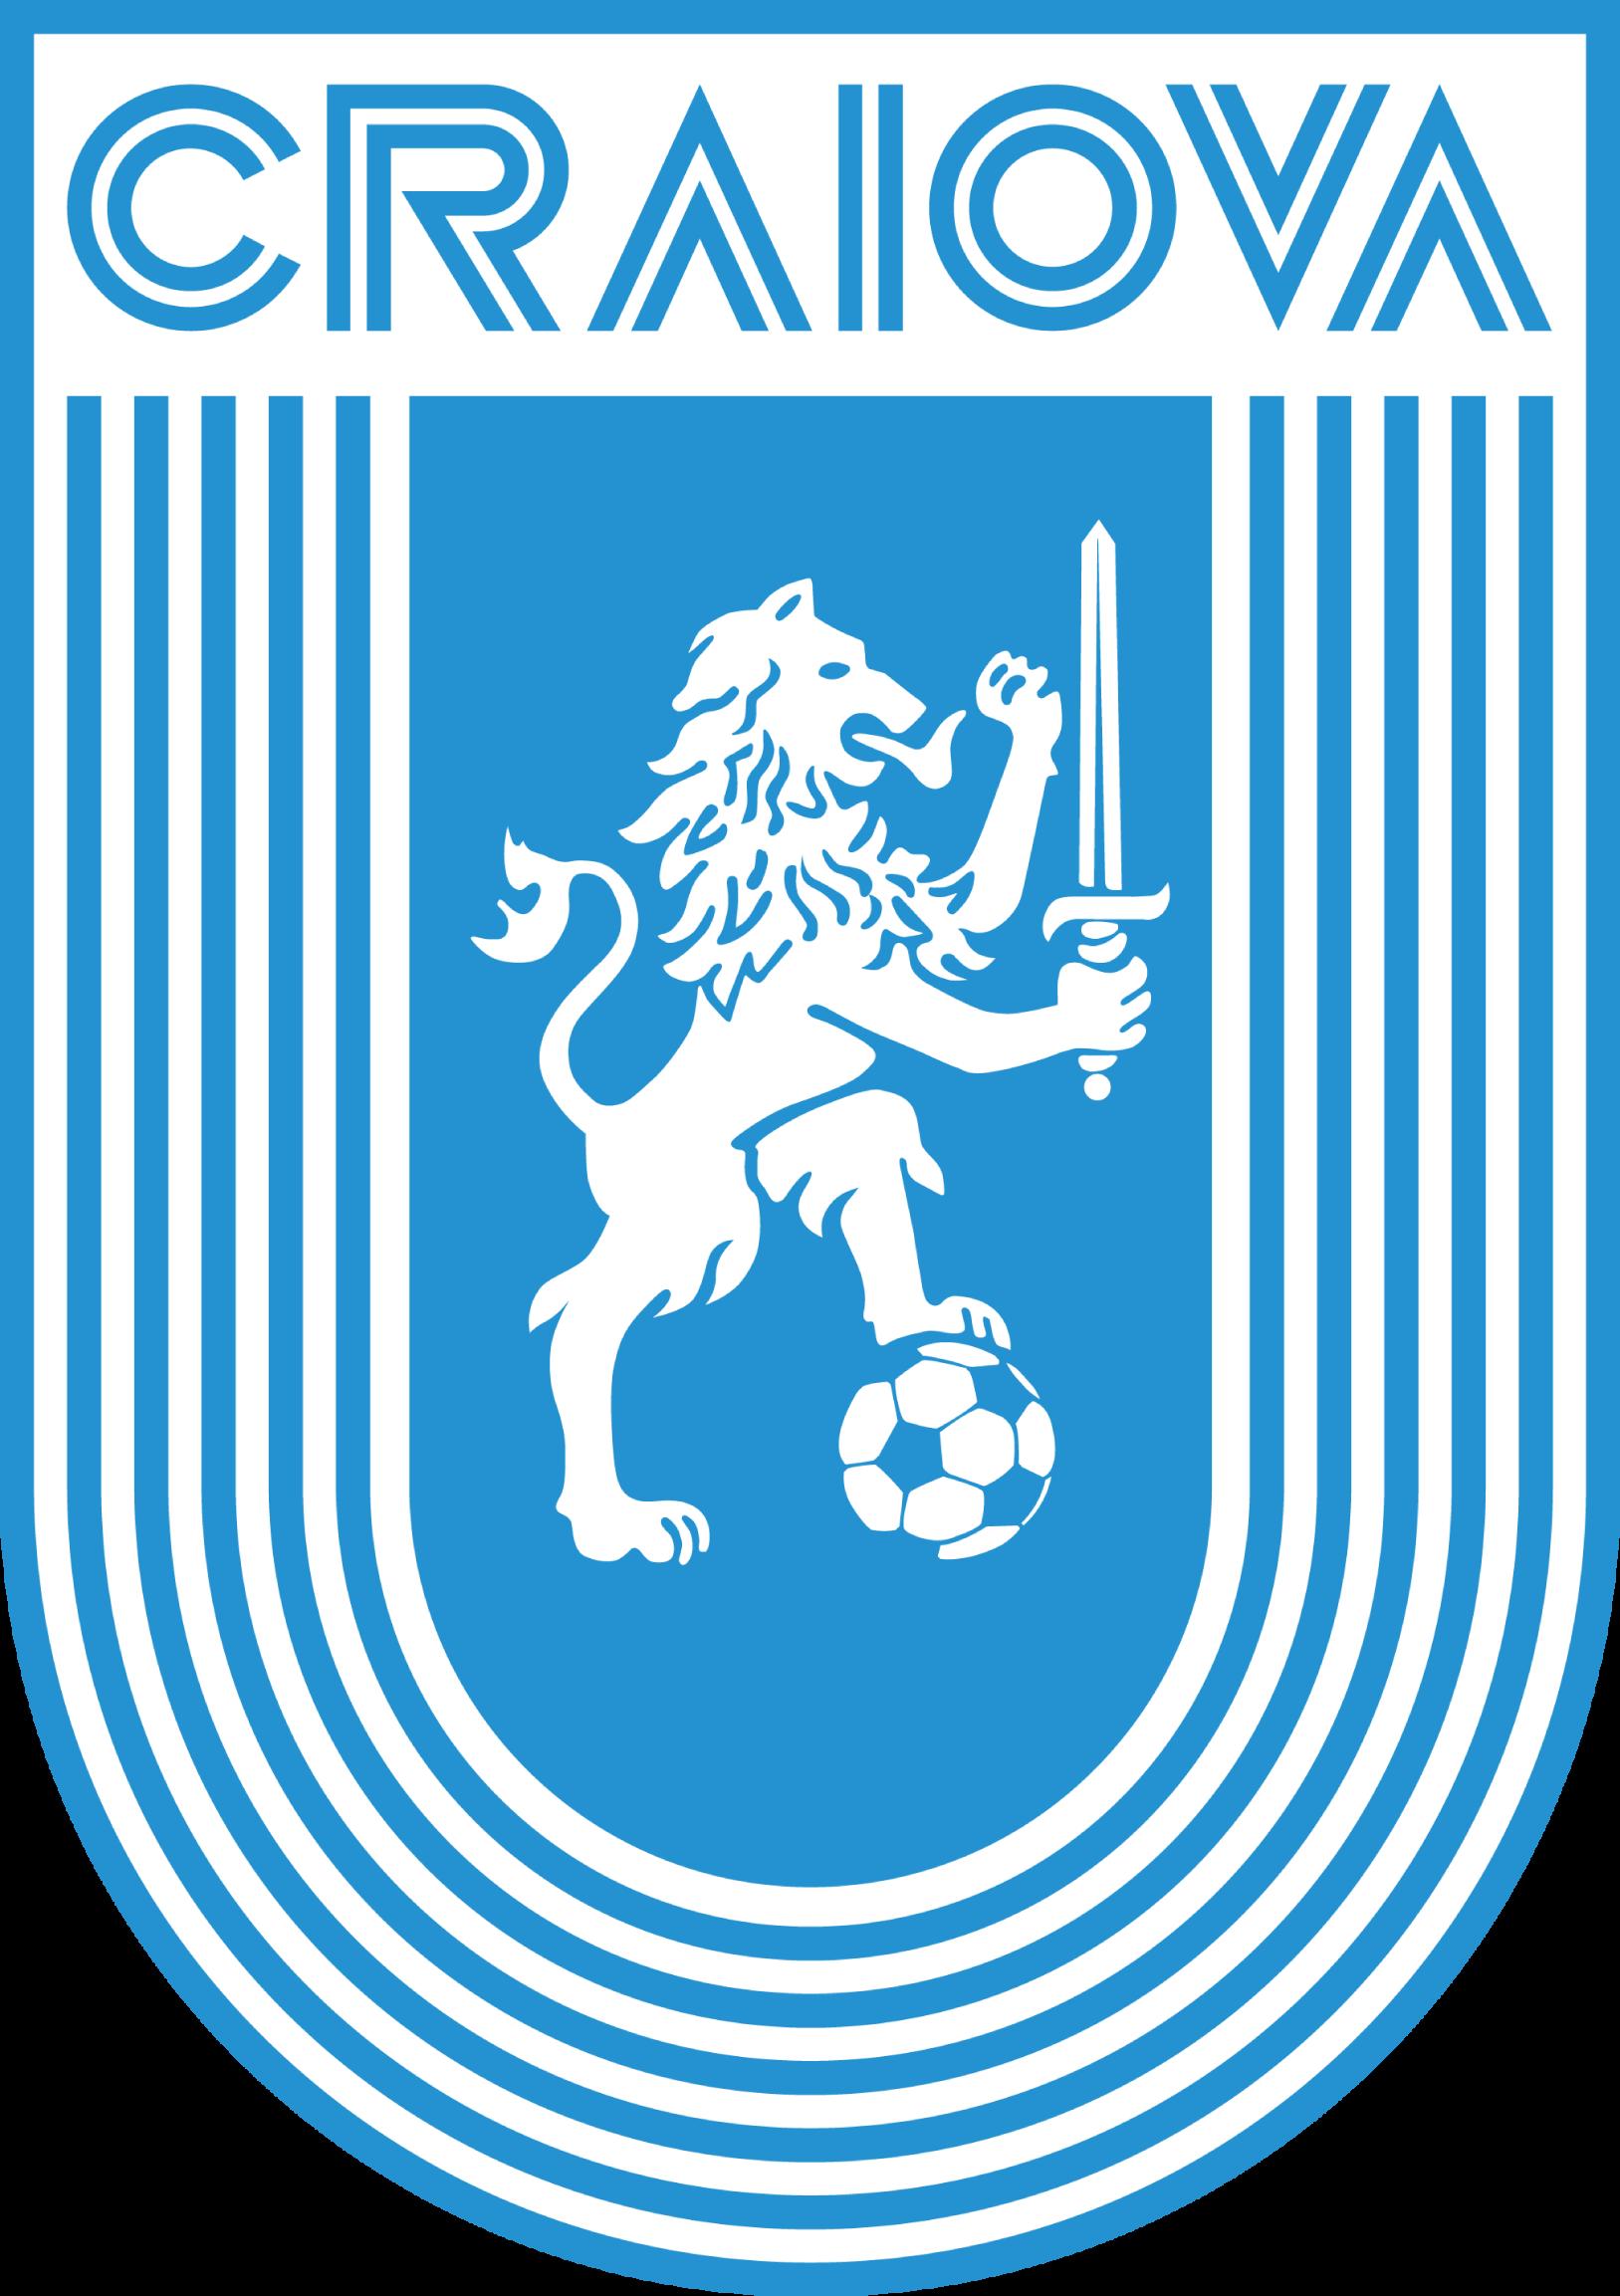 Universitatea Craiova | Football | Futbol, Football kits, Soccer